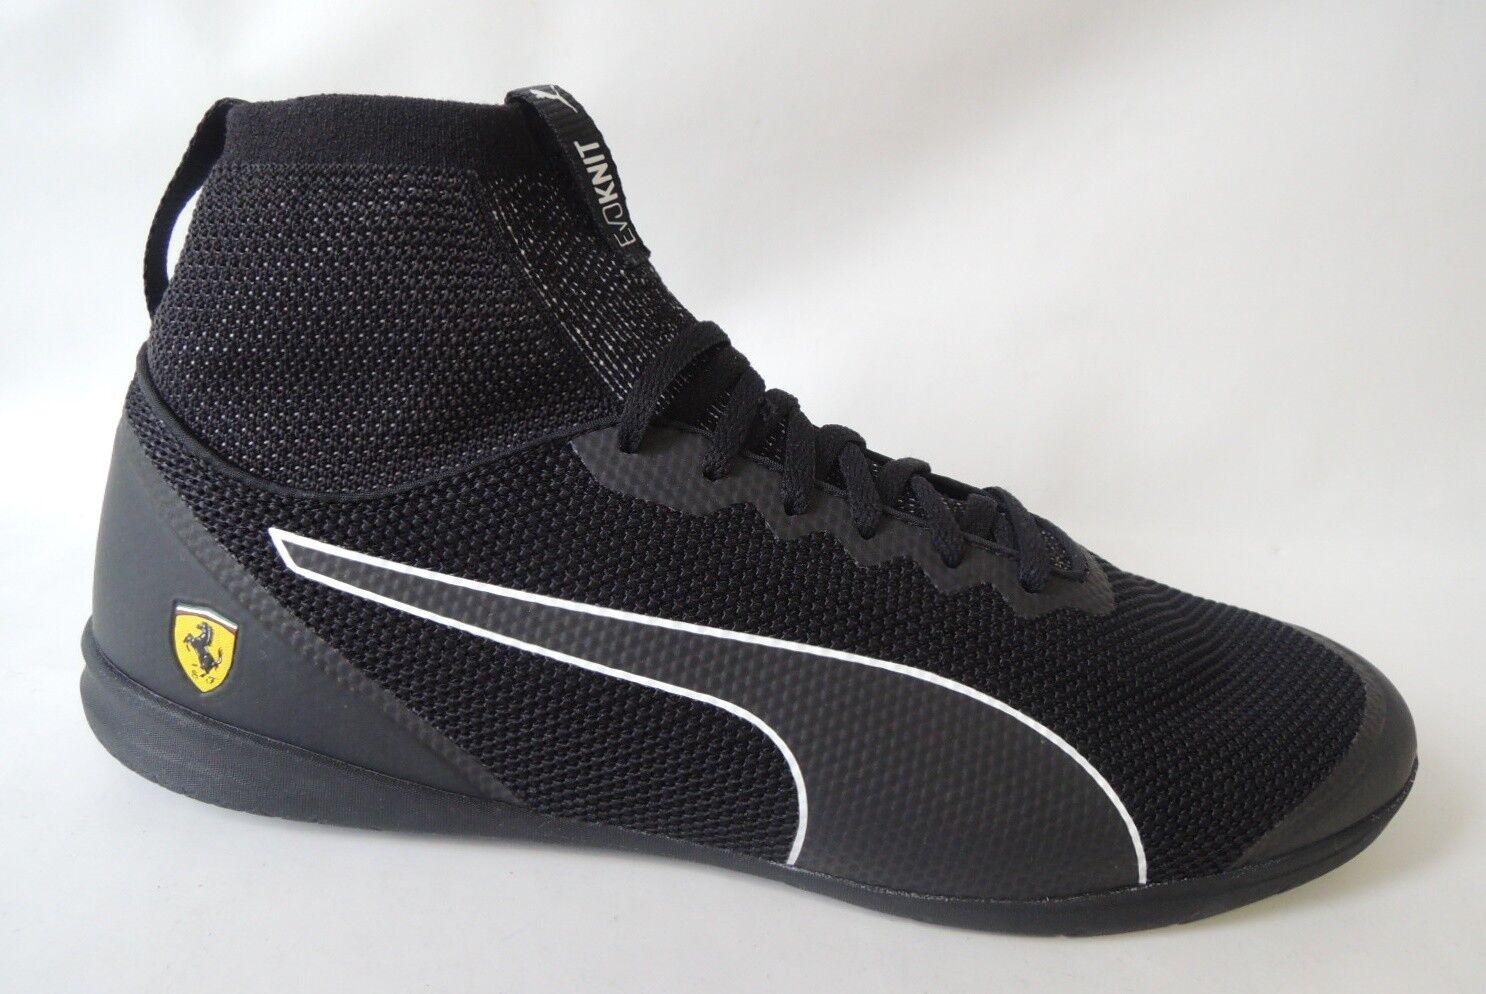 NEU Puma SF Changer Ignite Evoknit Ferrari 47 Socken Schuhe Sneaker 305919-02